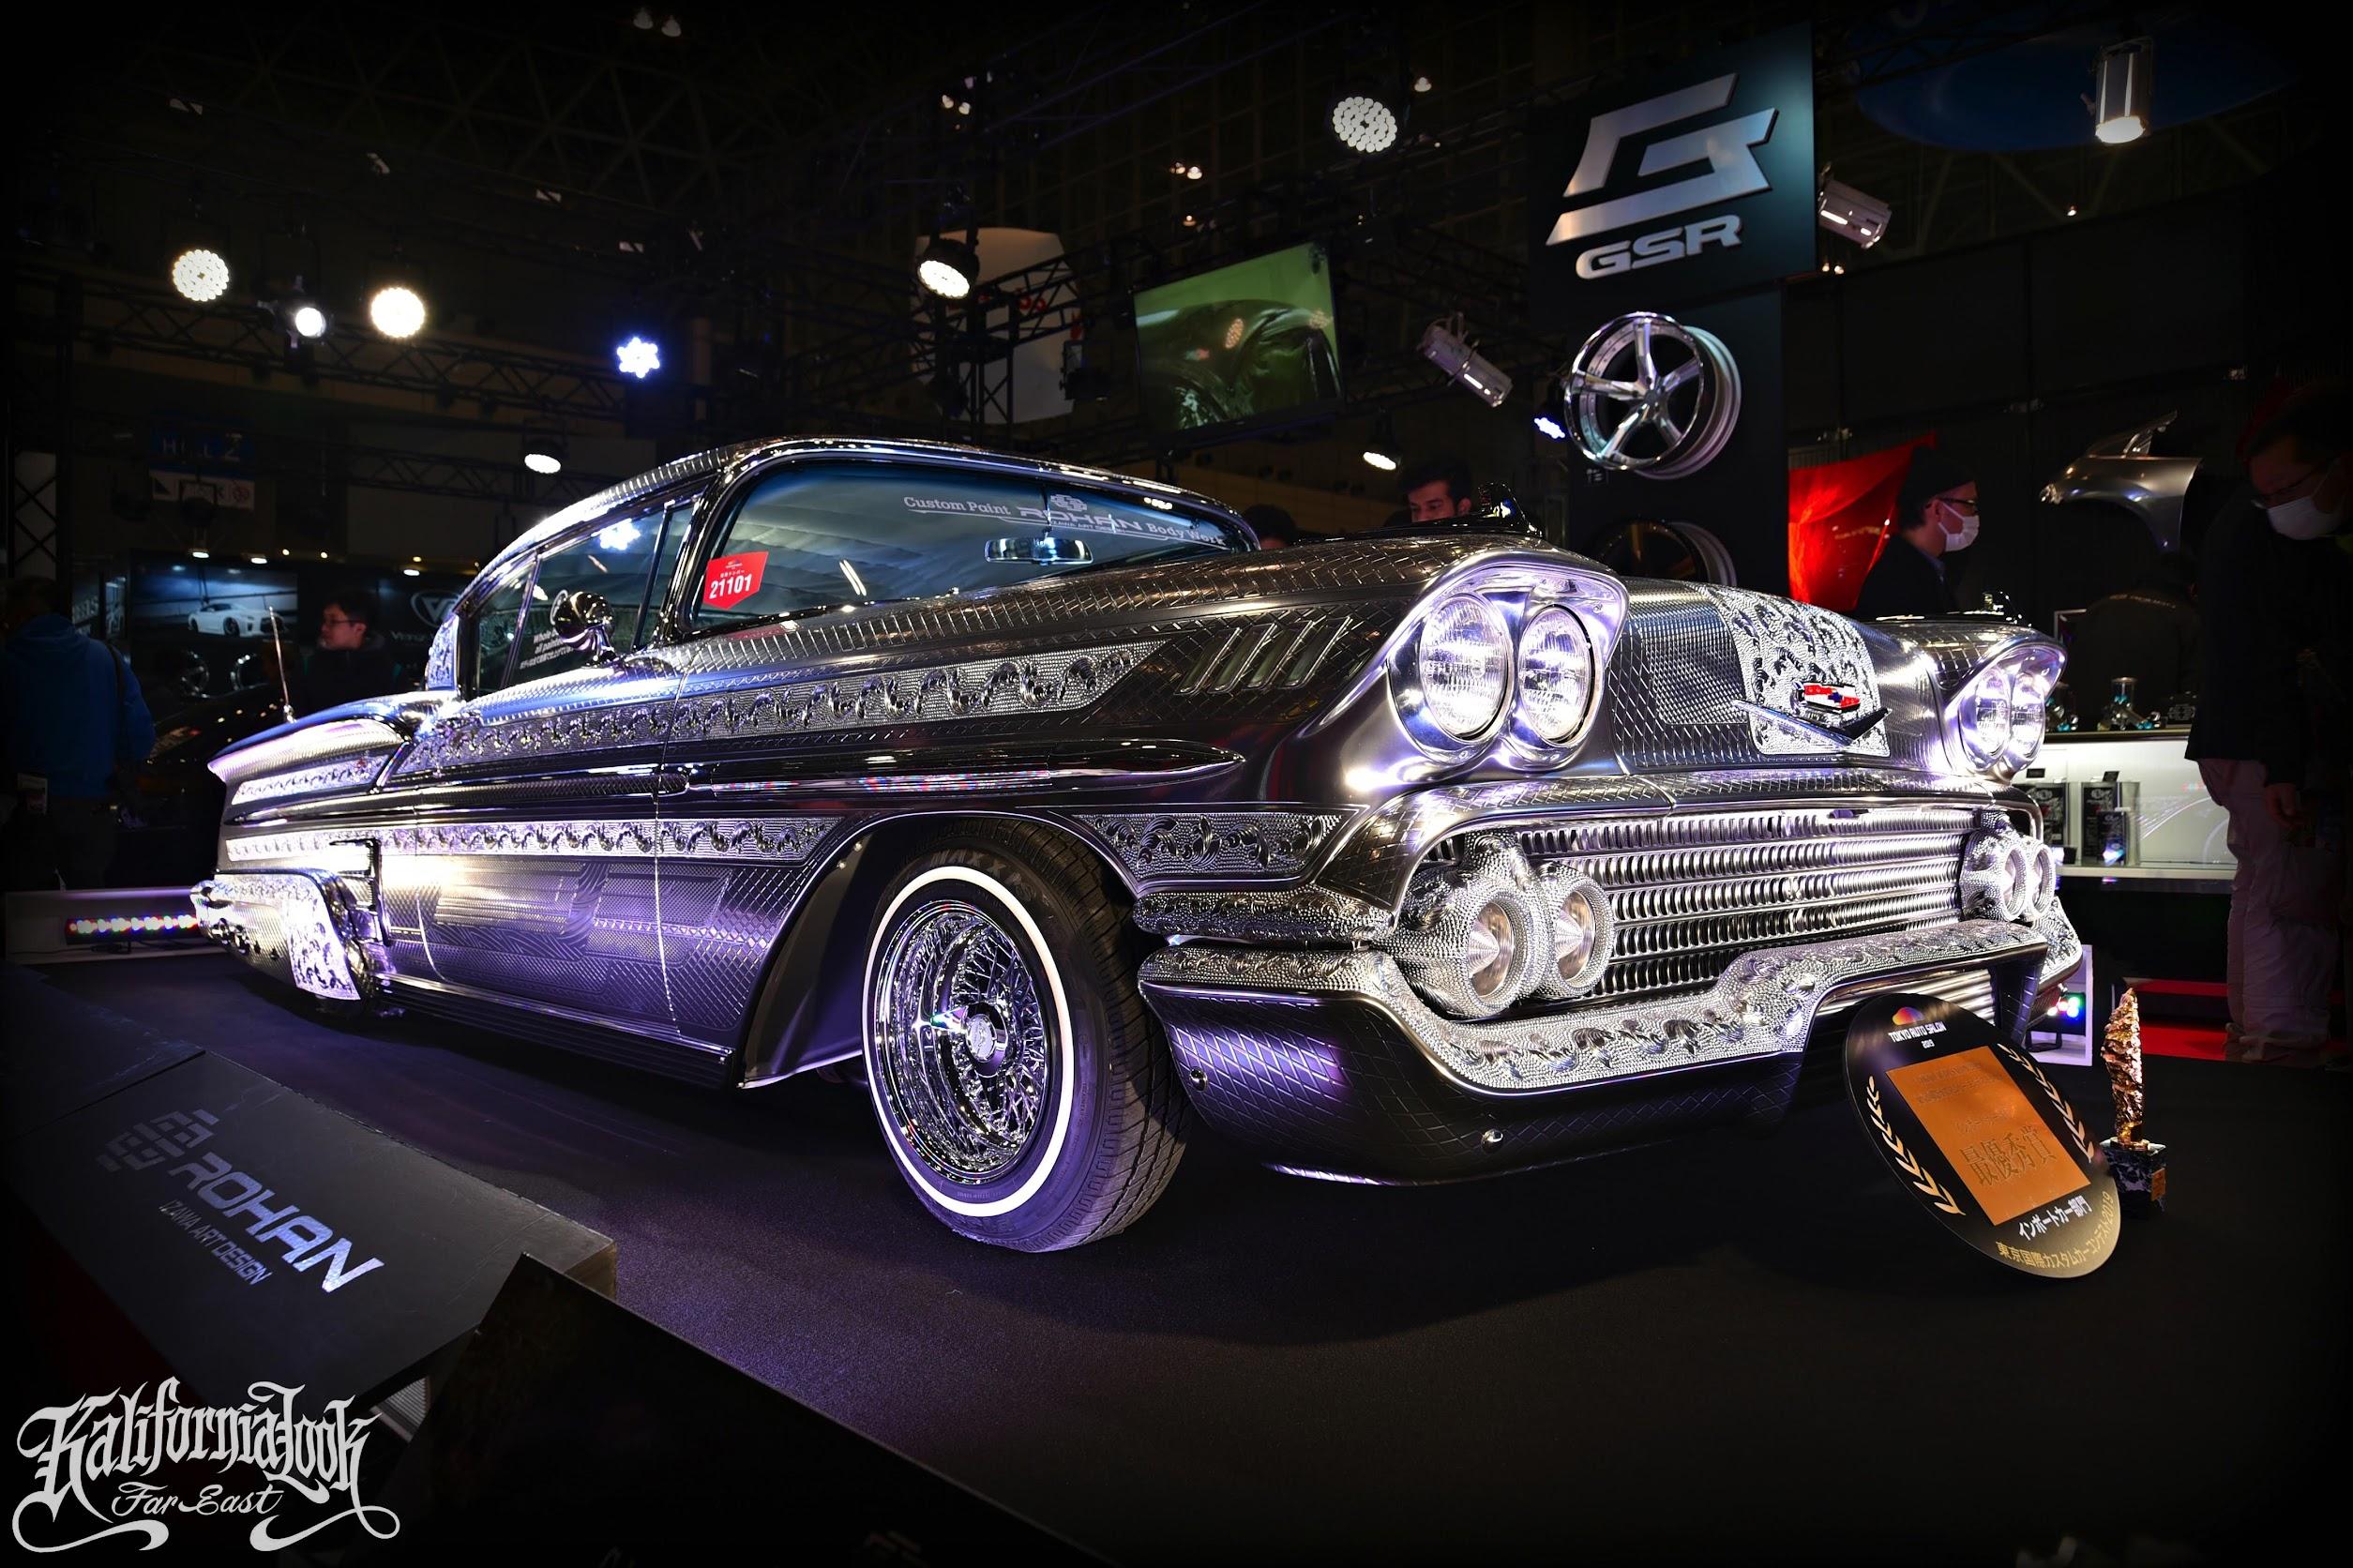 1958y Chevy Chromed Impala Lowrider Kalifornialook